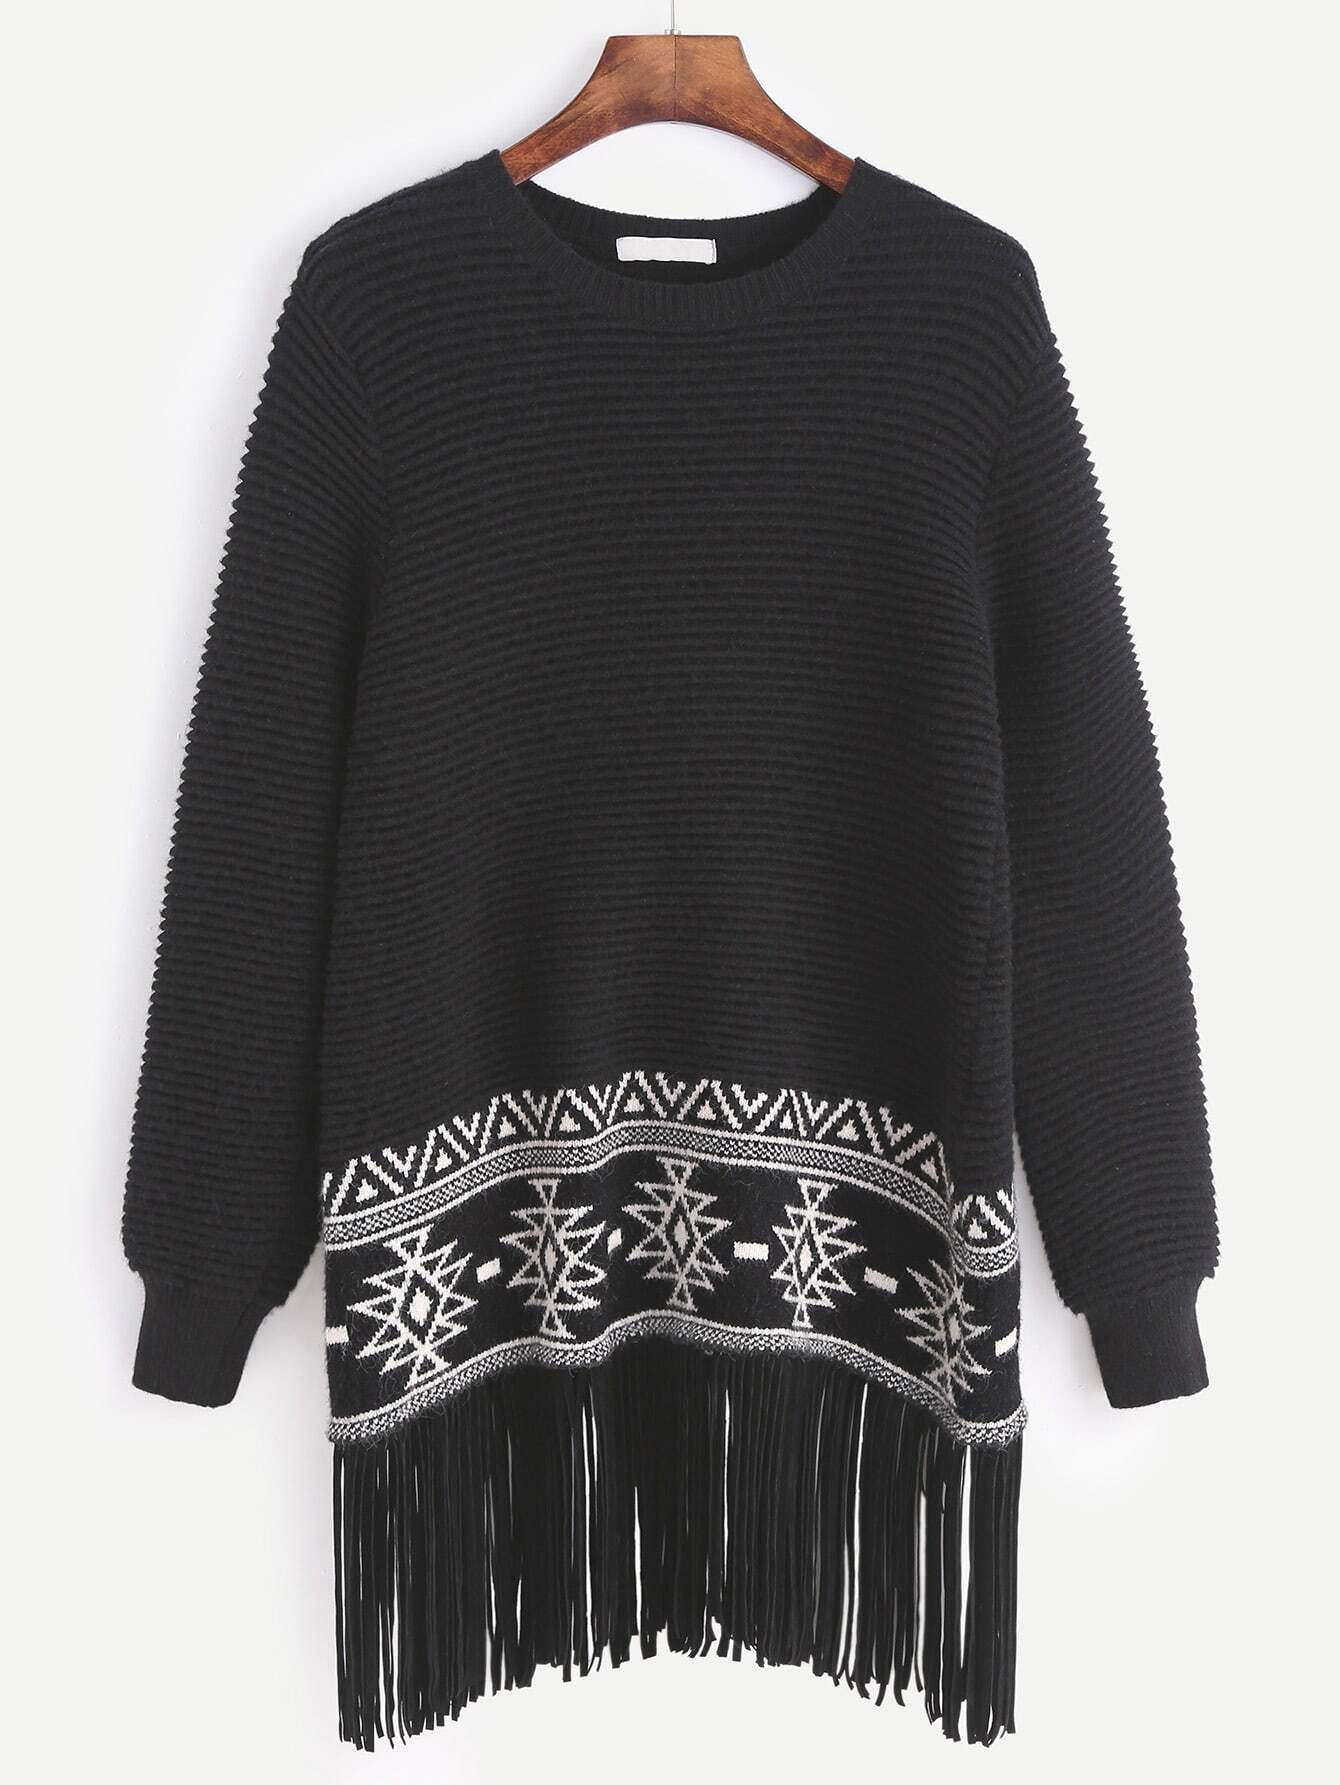 Black Ribbed Knit Tribal Pattern Fringe Sweater sweater161021463